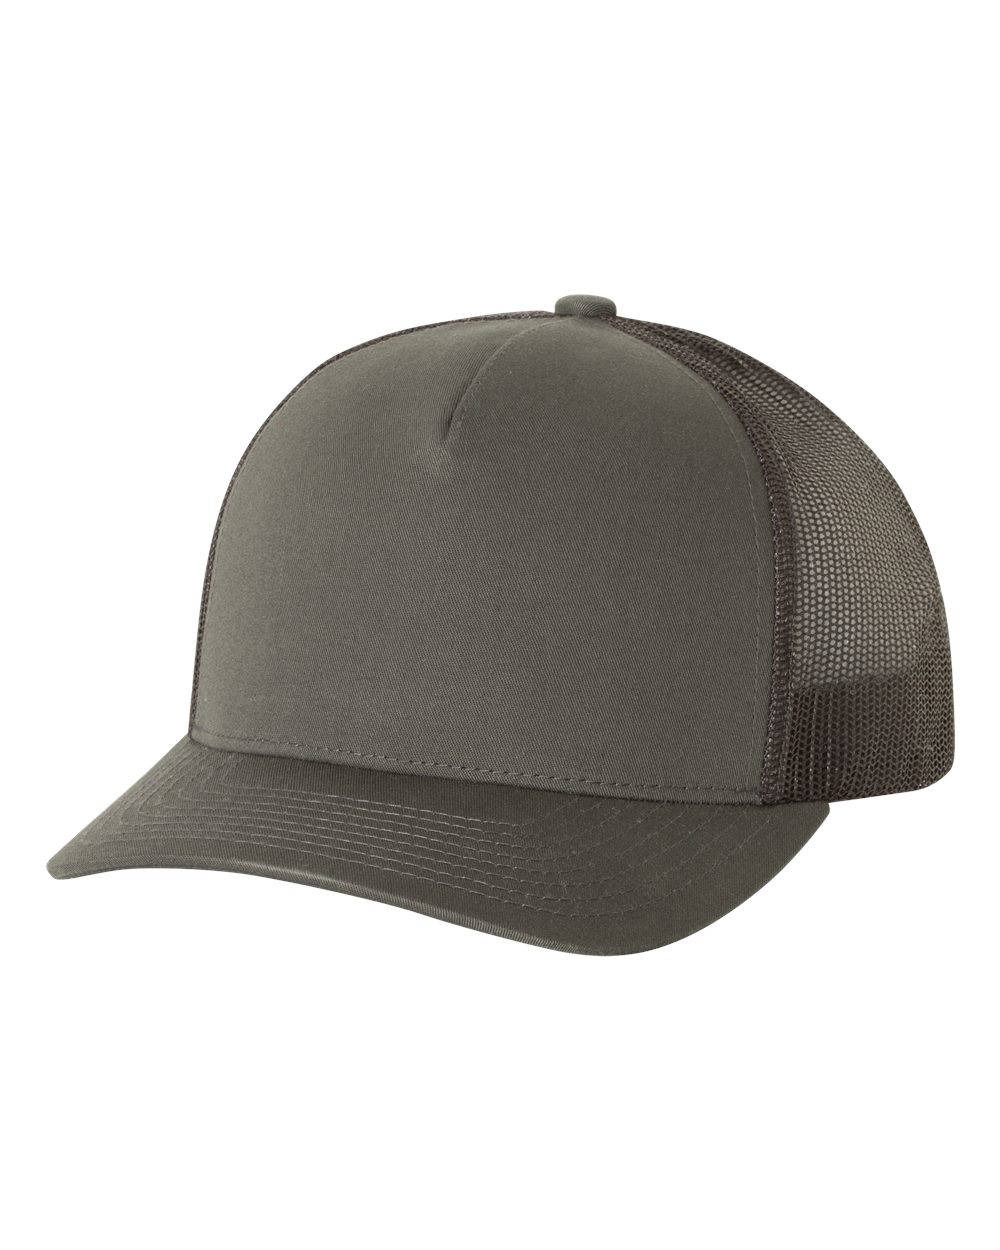 900f856087e Yupoong 6506 - Retro Snapback Trucker Cap  4.06 - Headwear